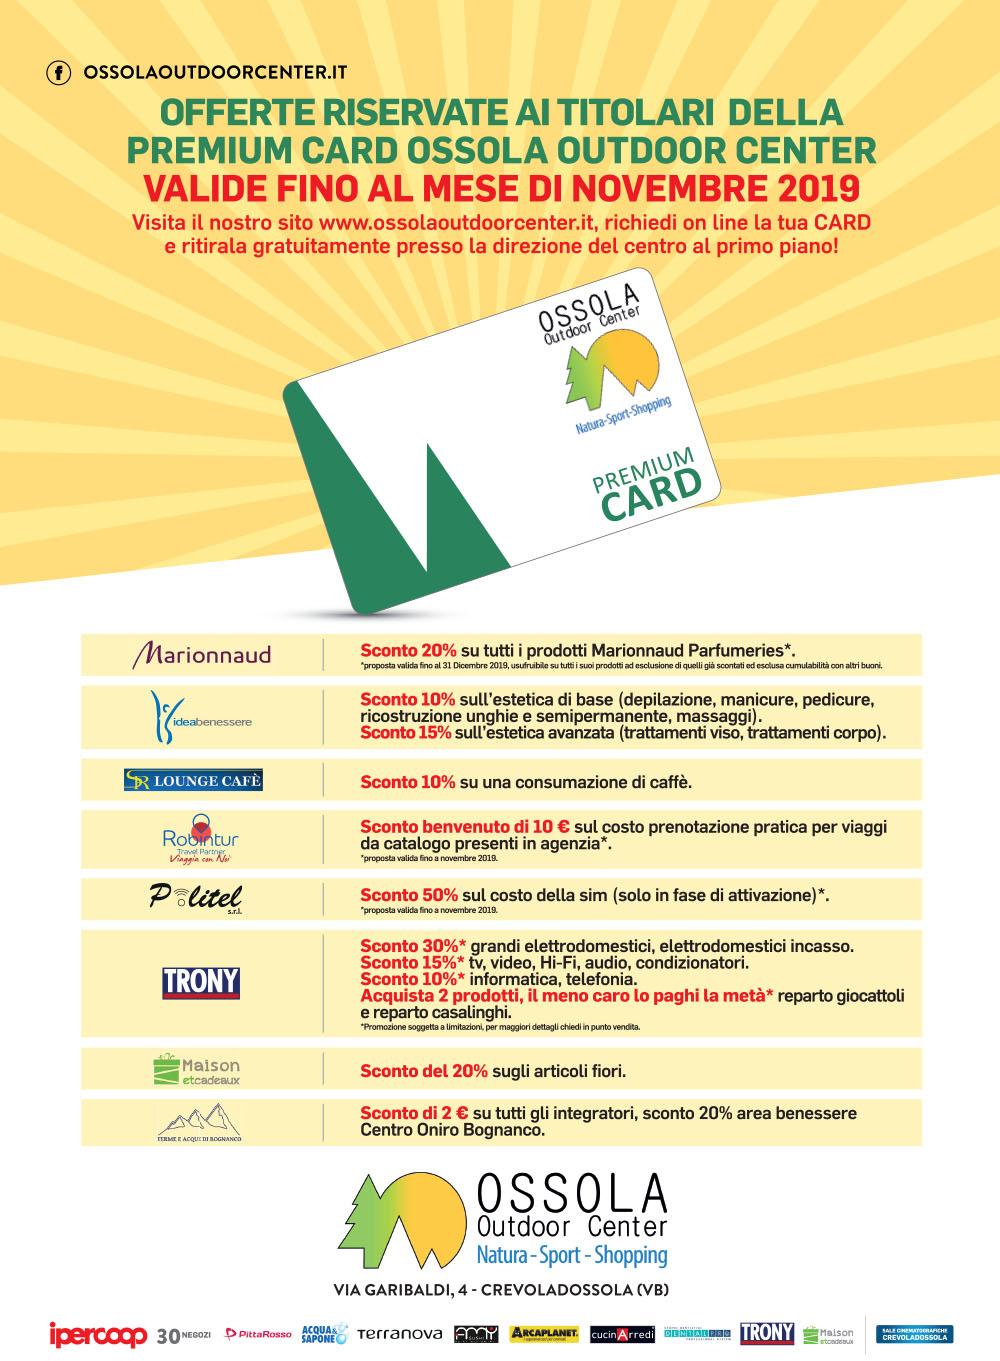 Premium Card Ossola Outdoor Center Offerte Valide Fino Al